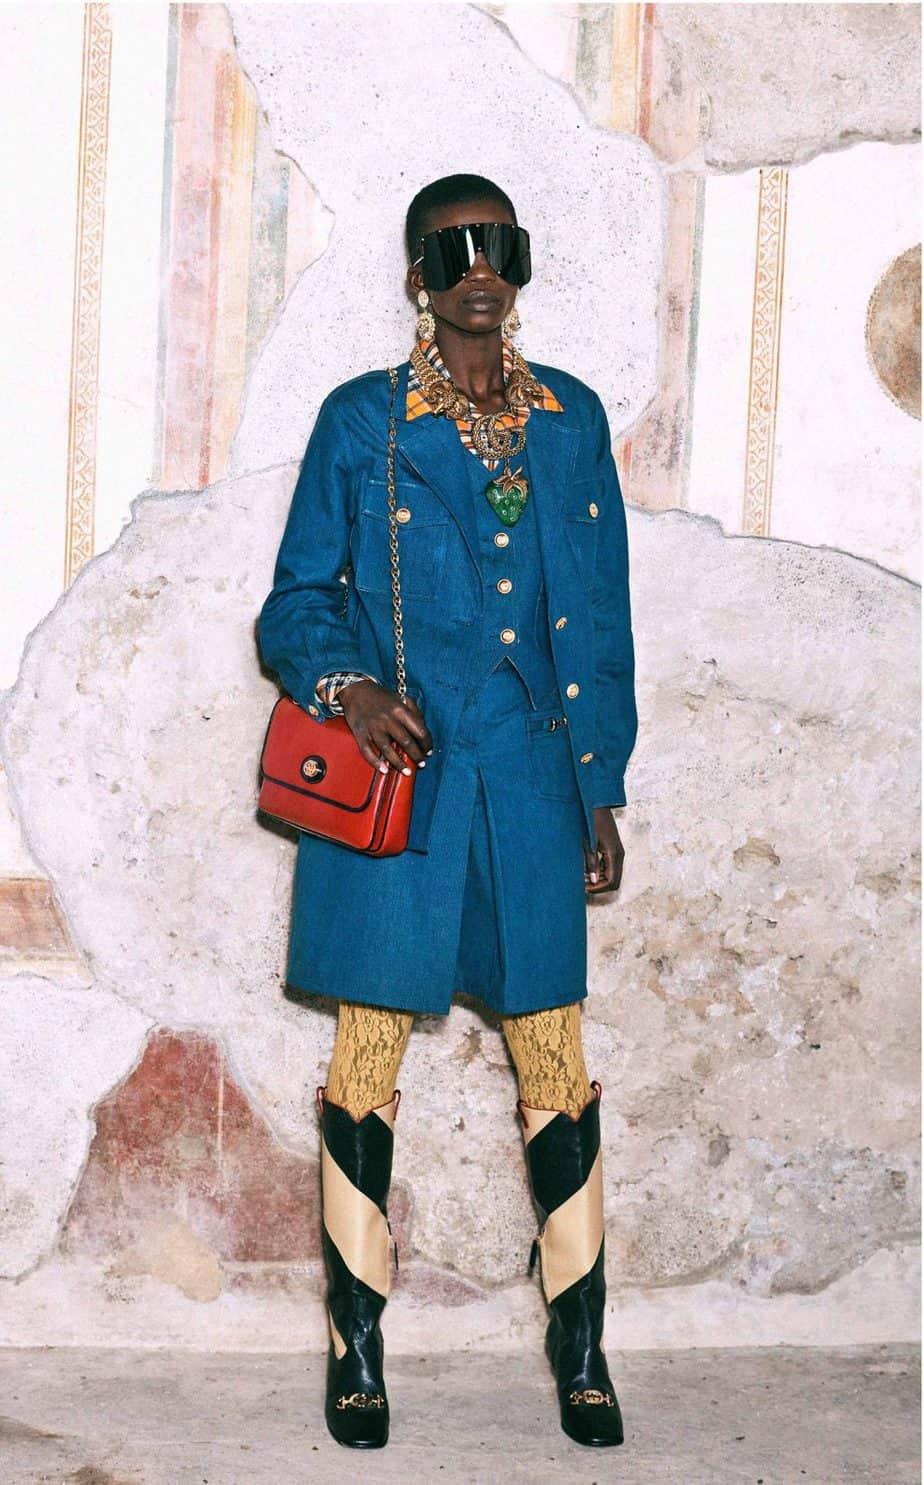 GUCCI, FALL 2019. WOMEN'S FASHION, Photographer Harmony Korine, Art Director, Christopher Simmonds - 85